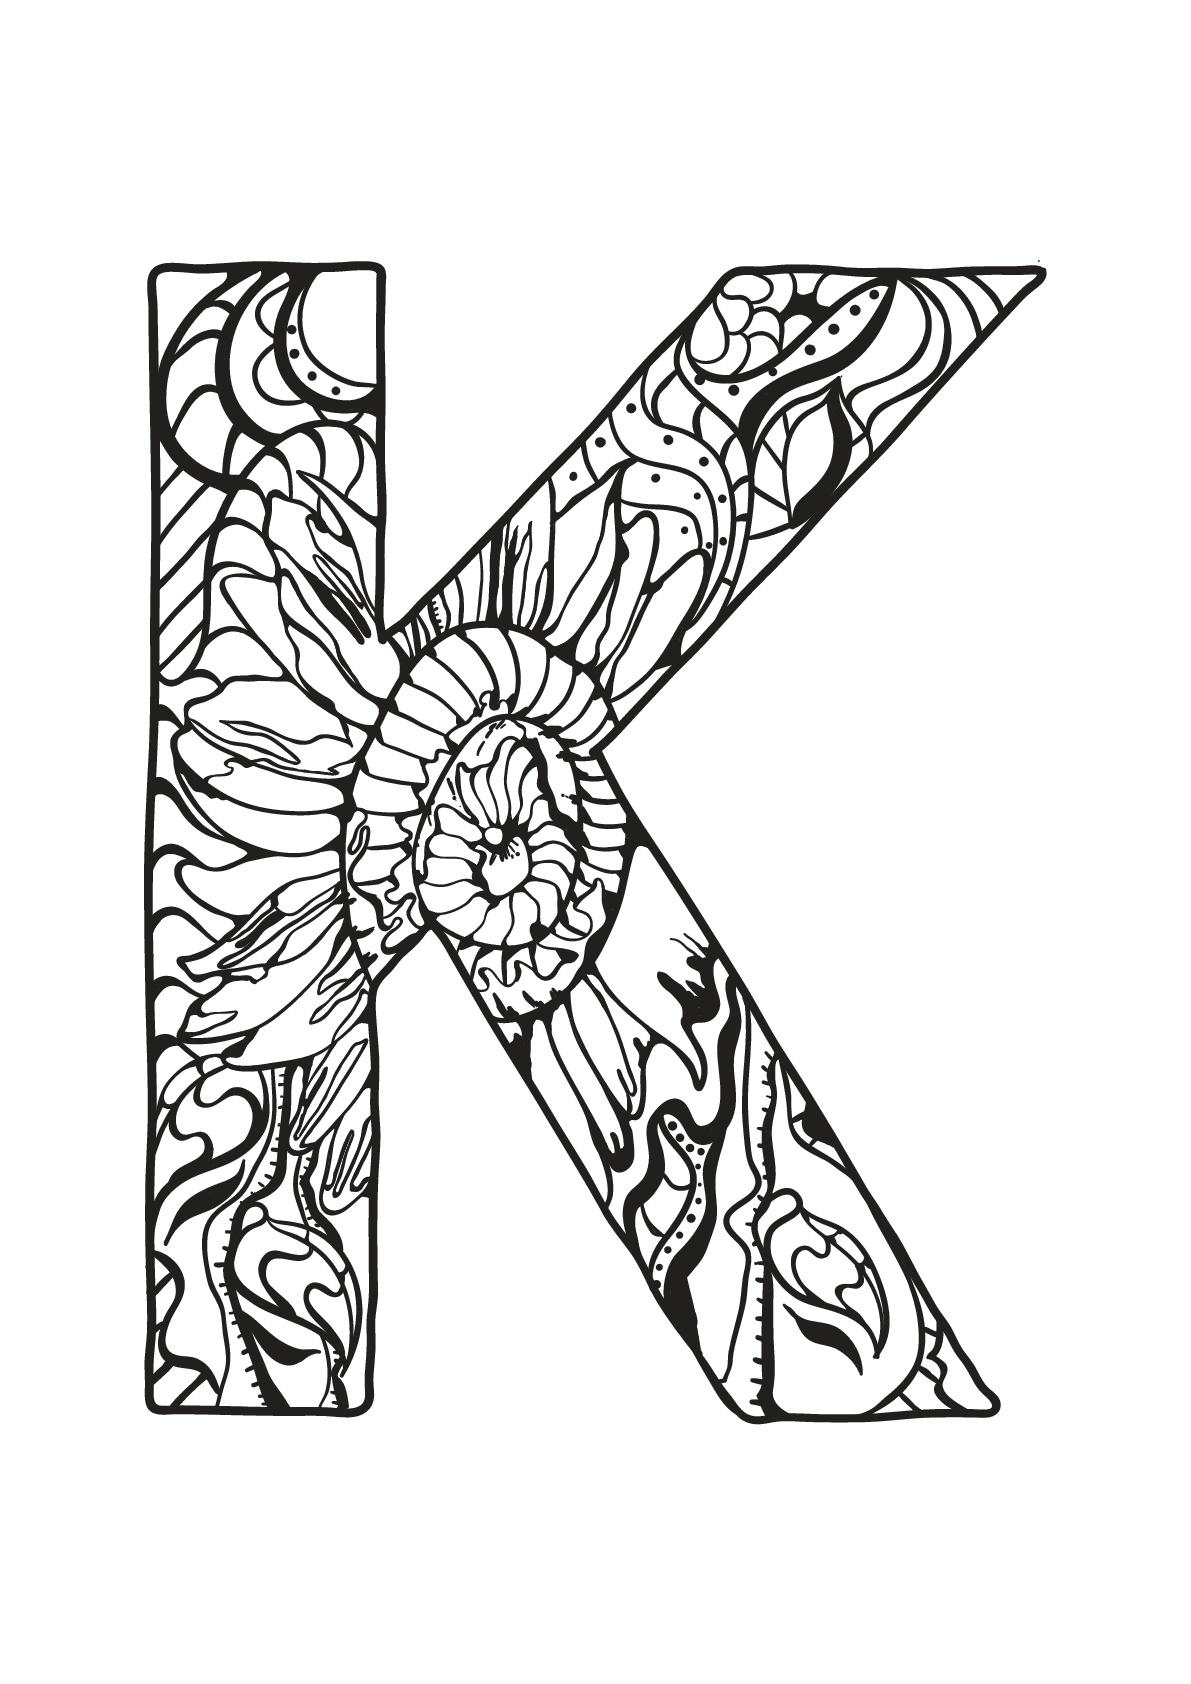 Alphabet free to color for children : K - Alphabet Kids ...